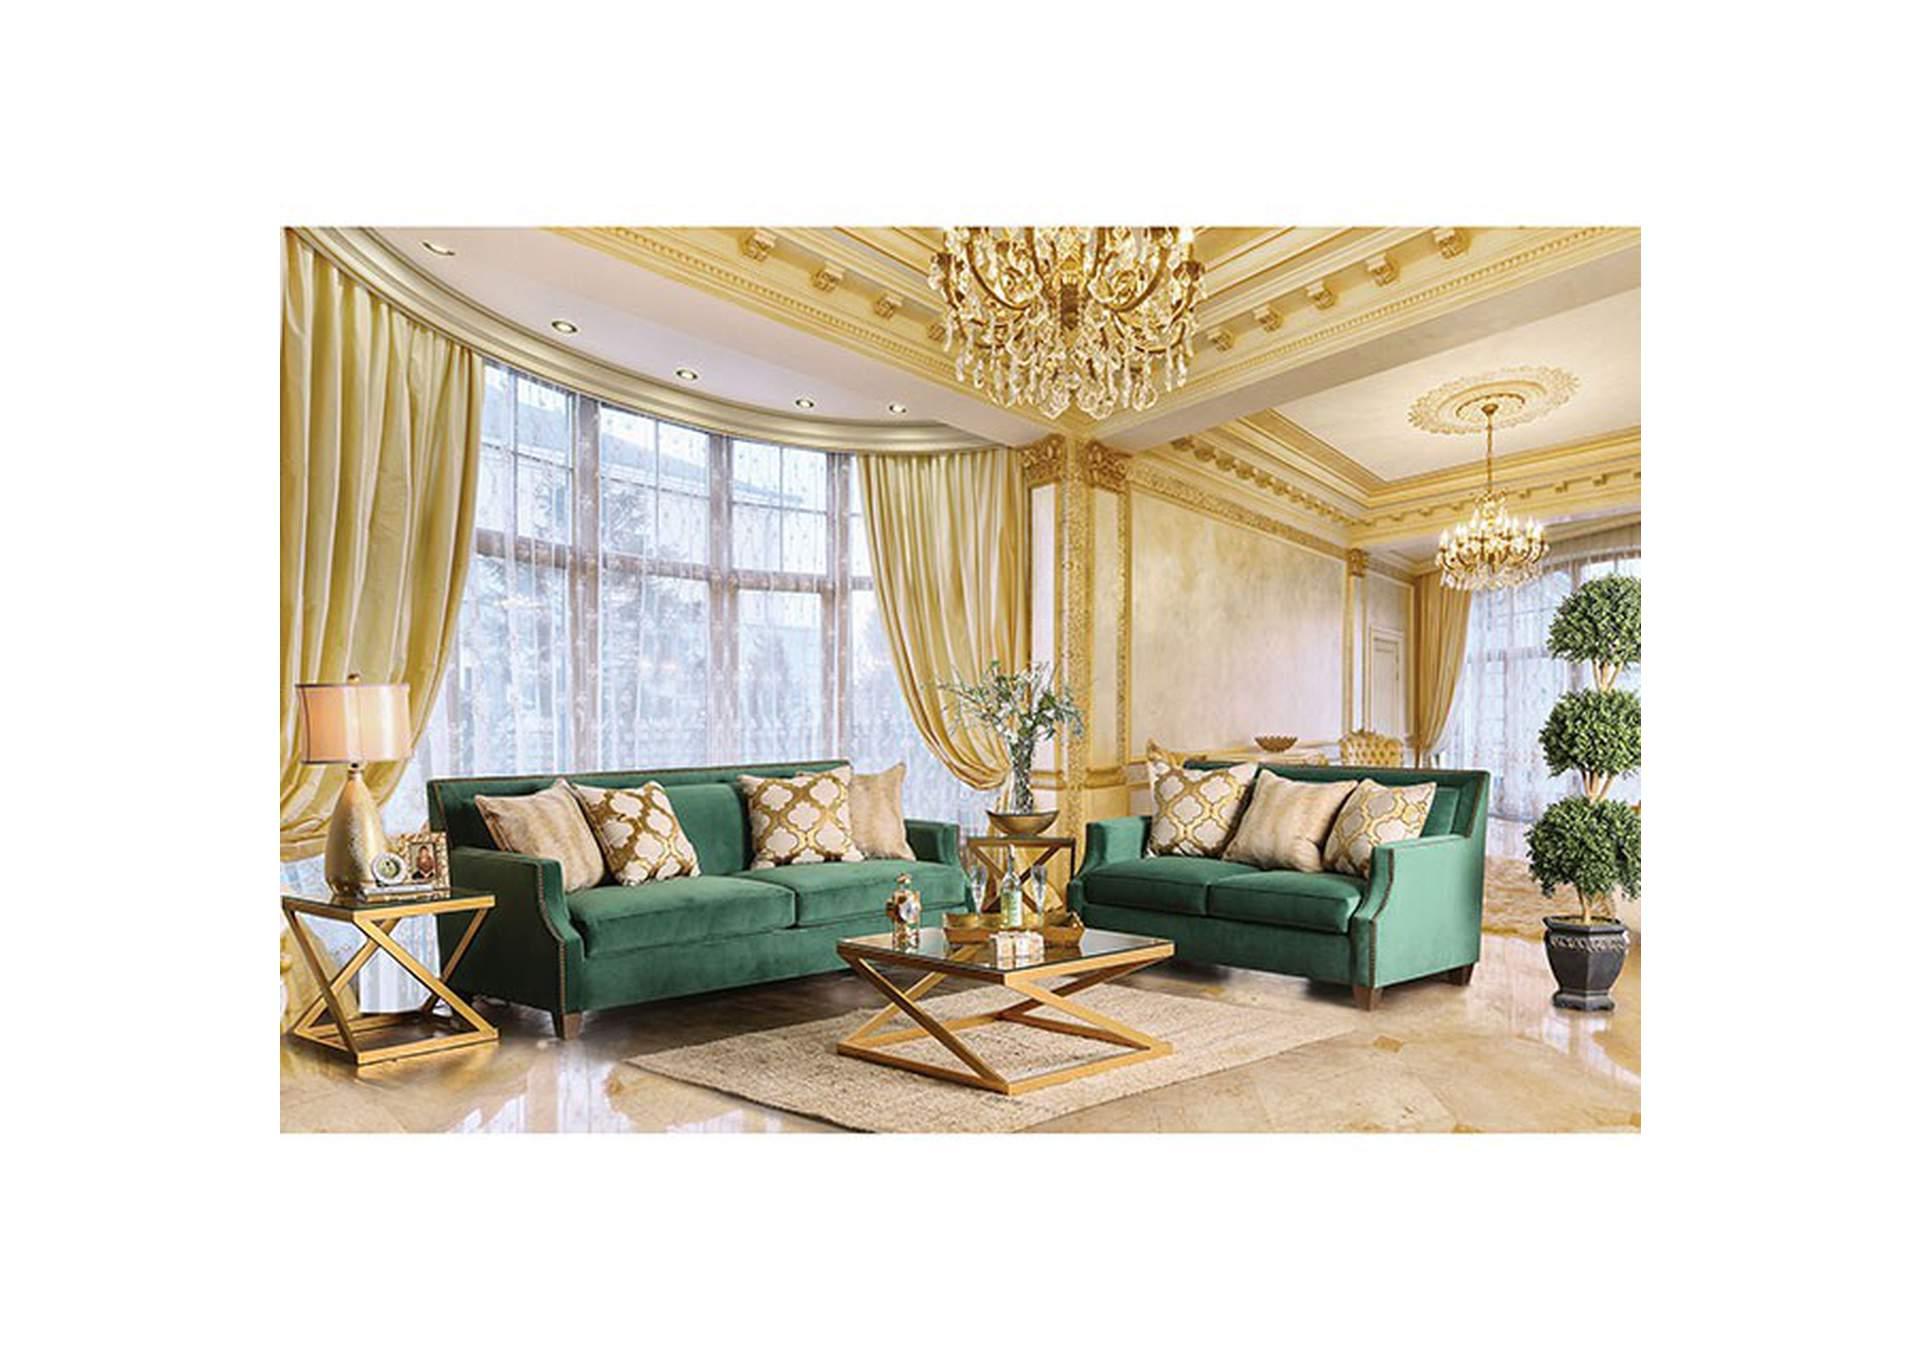 363082 Verdante Emerald Green Sofa and Loveseat Set w/Pillows